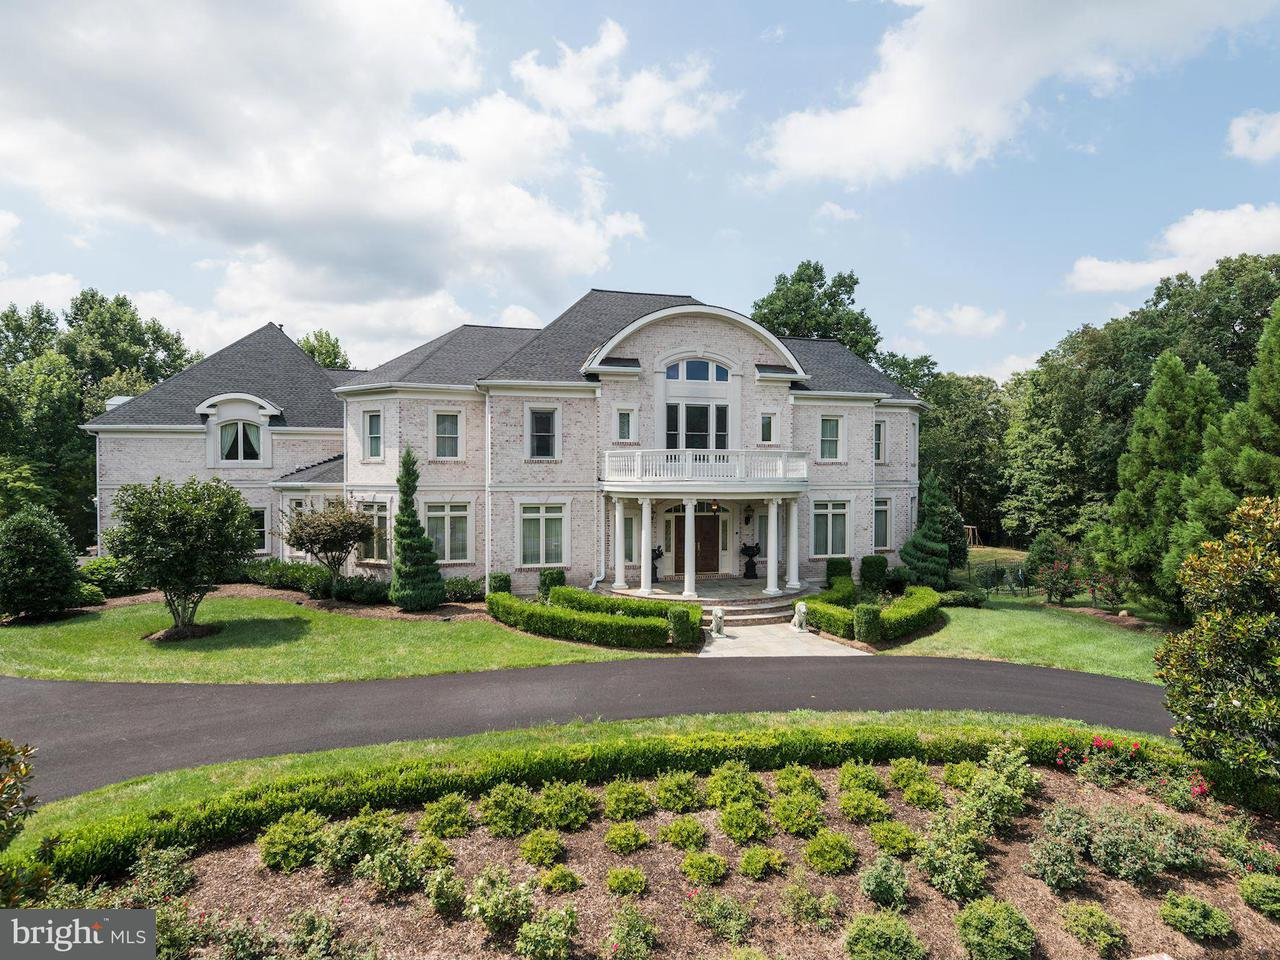 Single Family Home for Sale at 1122 Marlene Lane 1122 Marlene Lane Great Falls, Virginia 22066 United States